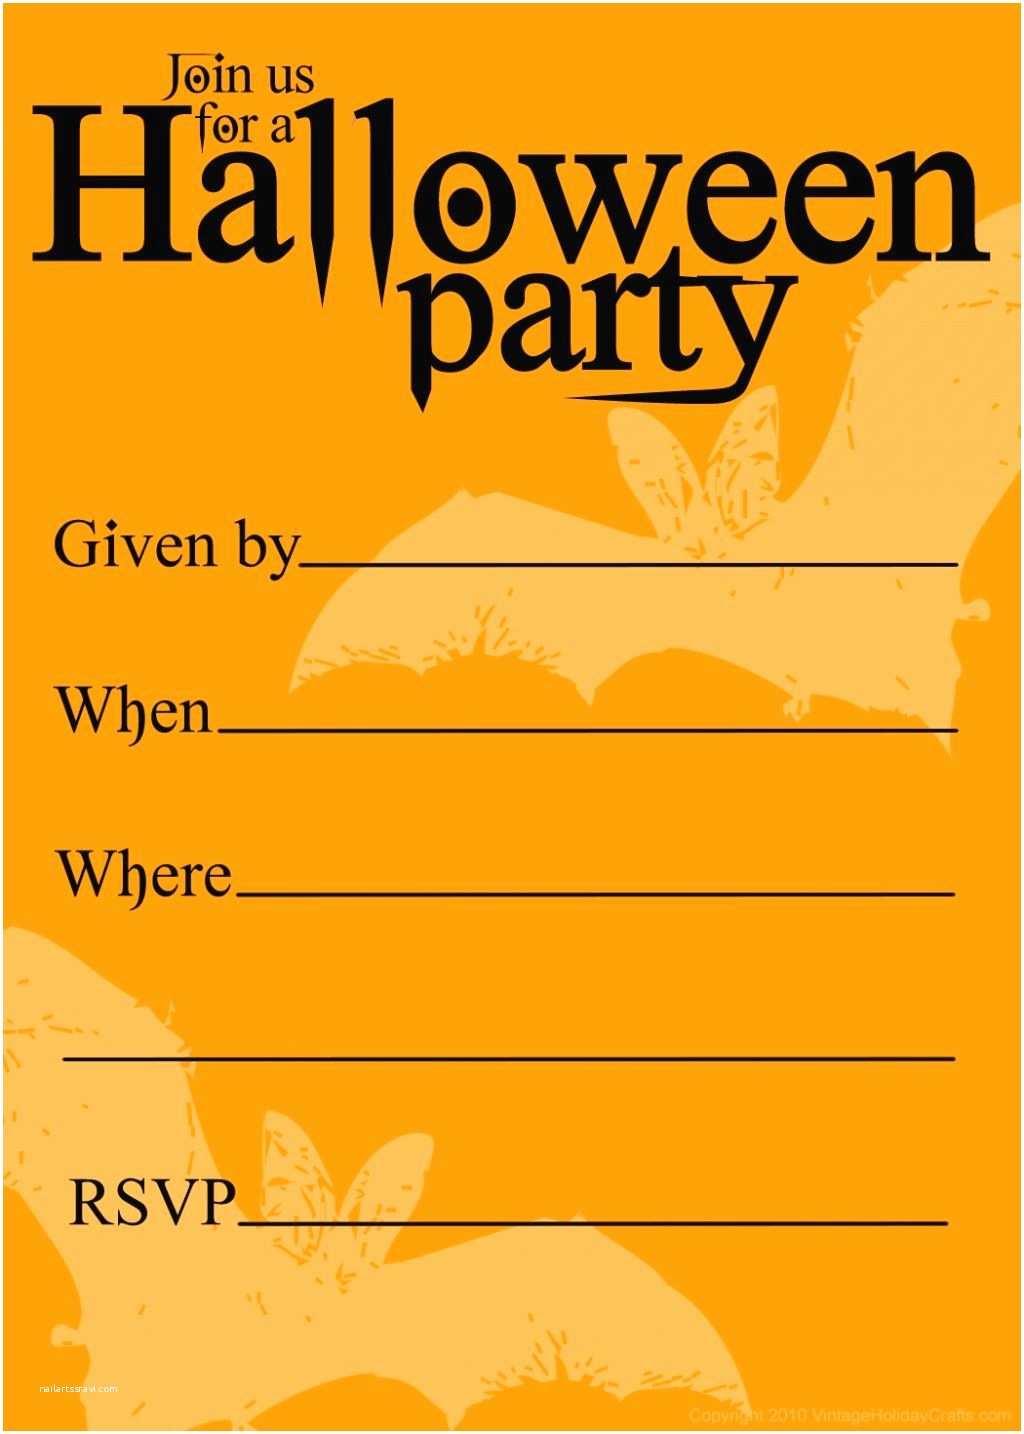 Free Halloween Party Invitations Free Printable Halloween Birthday Invitations Templates